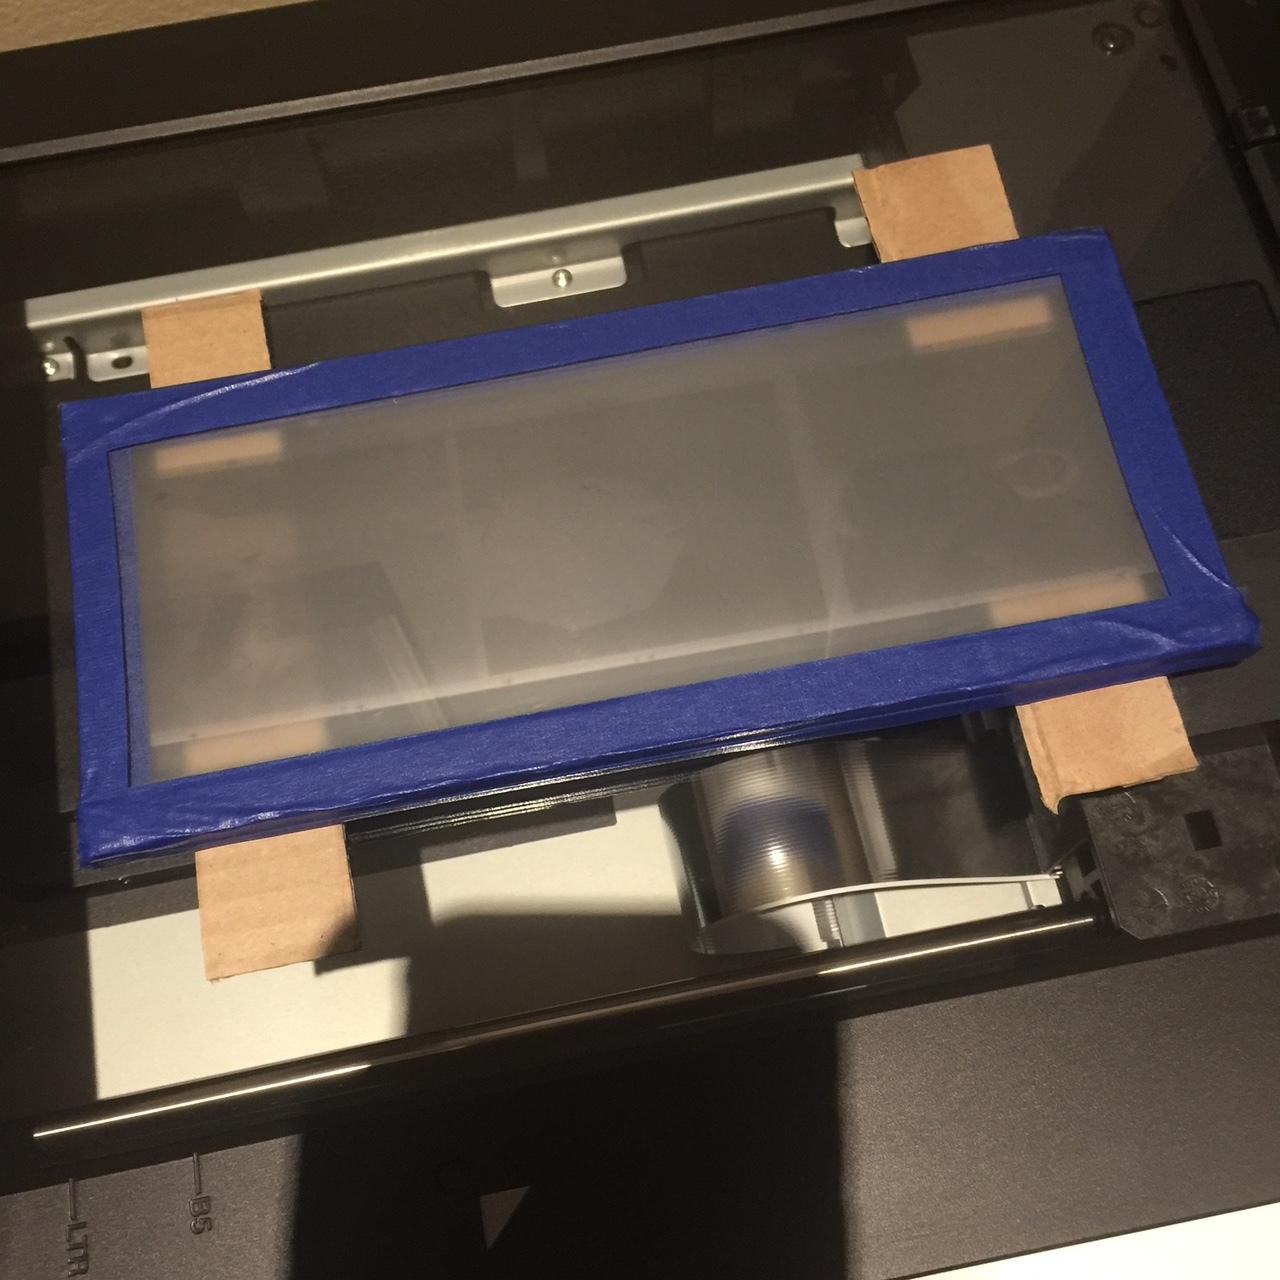 Slide carrier on Epson v750 flatbed